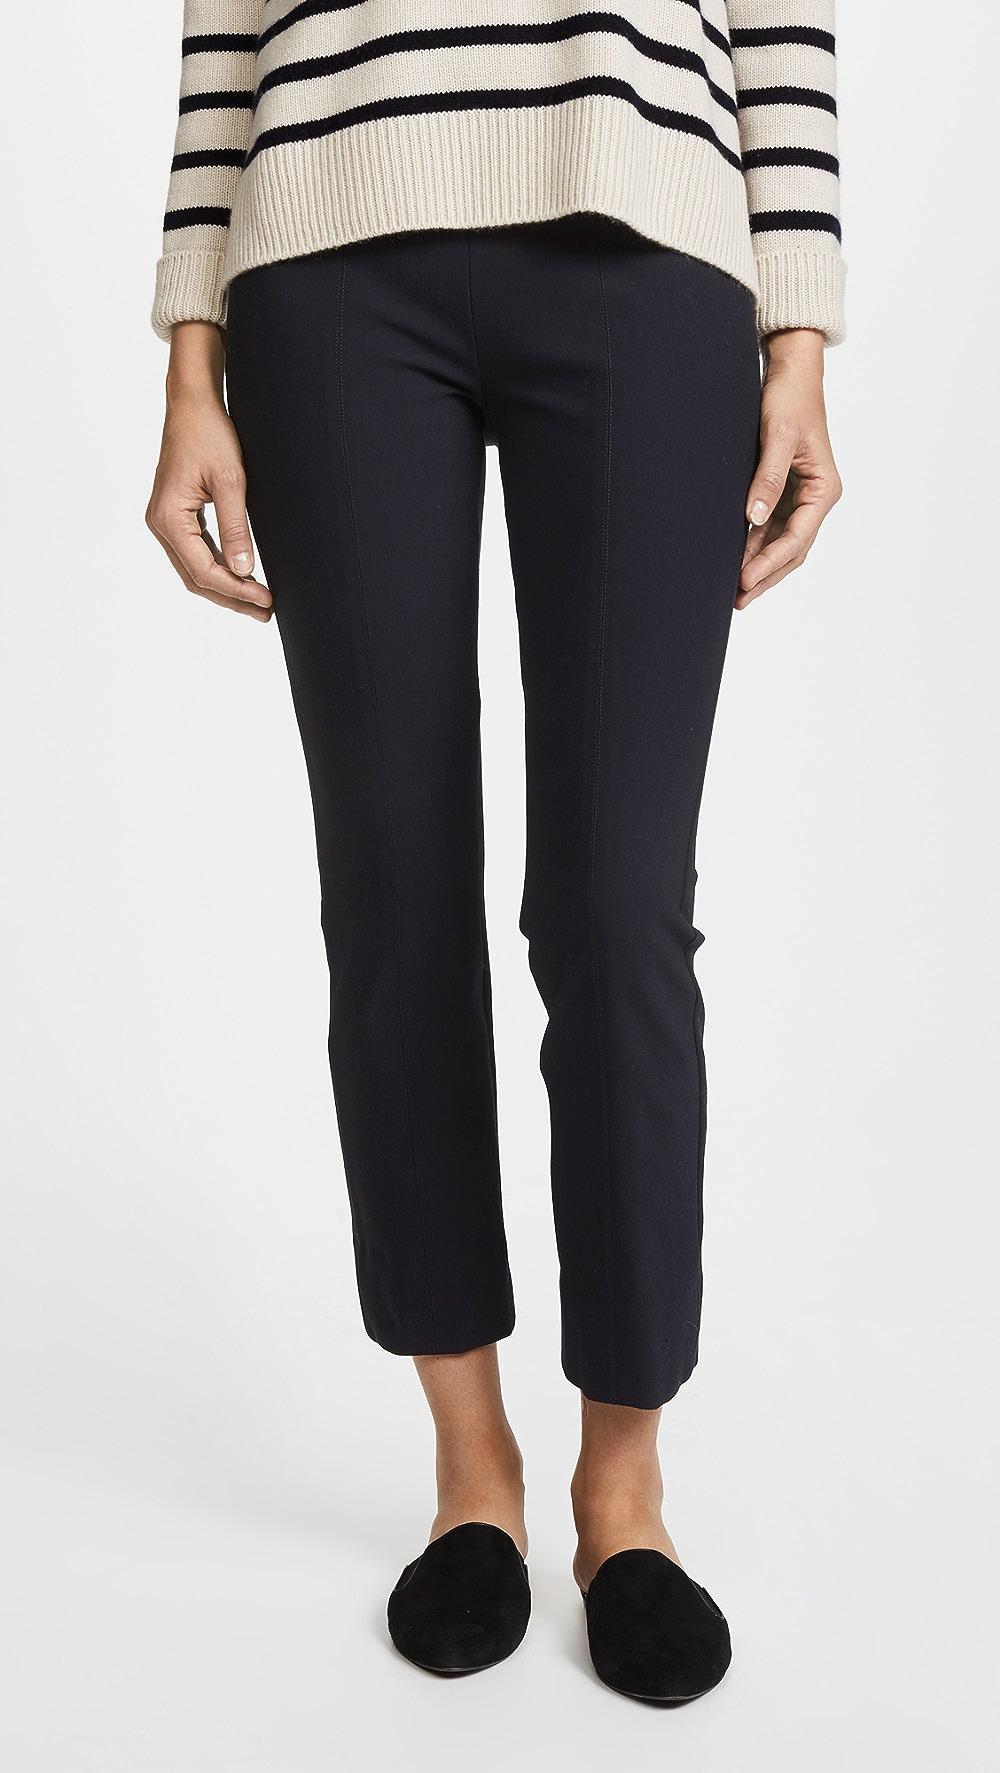 100% Quality Vince - Stitch Front Seam Legging Pants Shrink-Proof